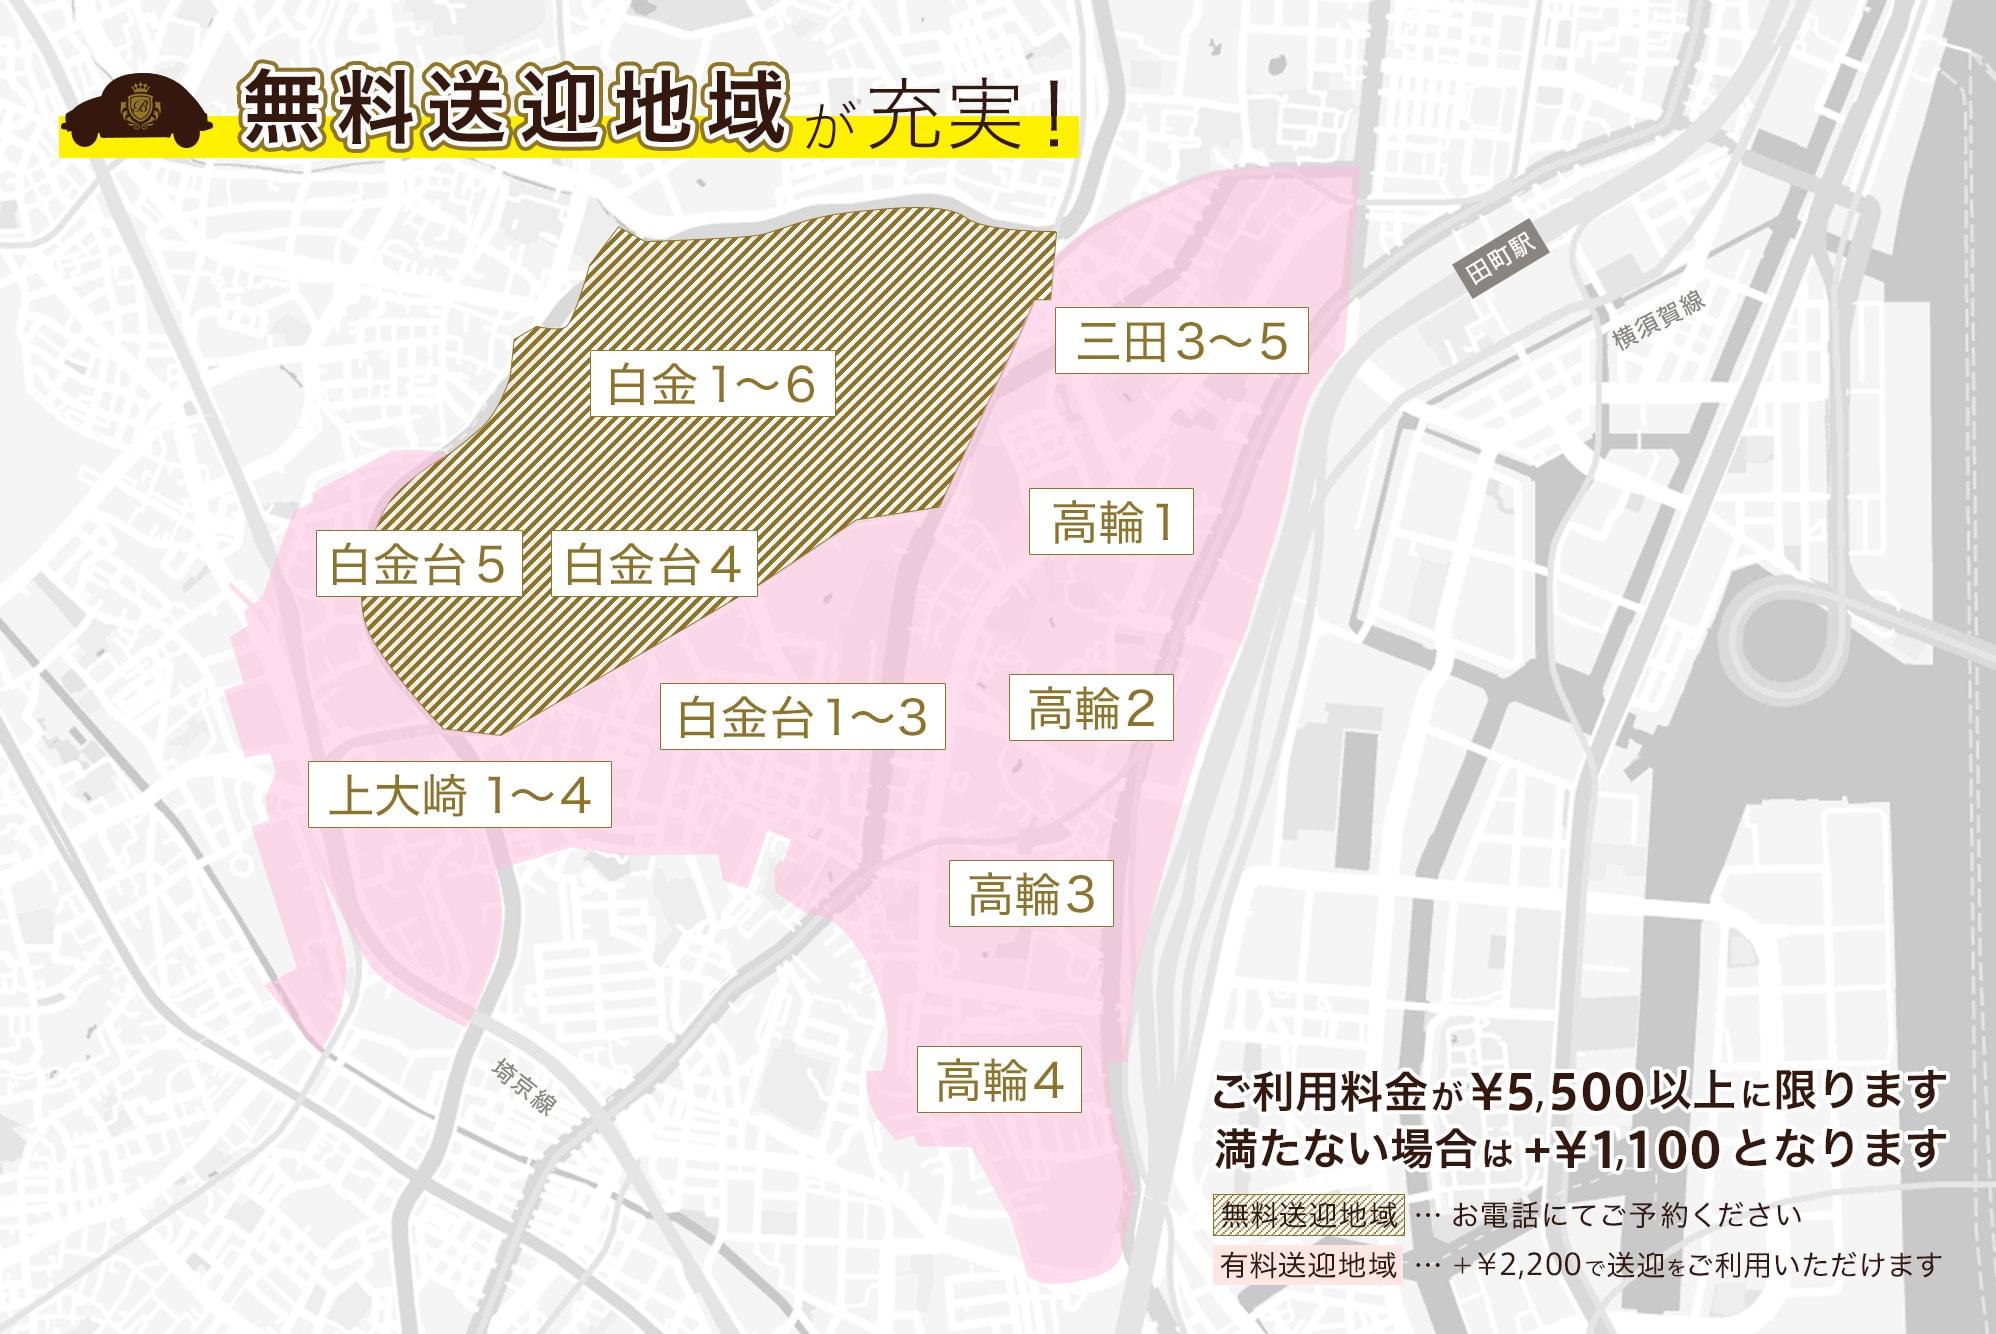 無料送迎地域【白金・白金台エリア】